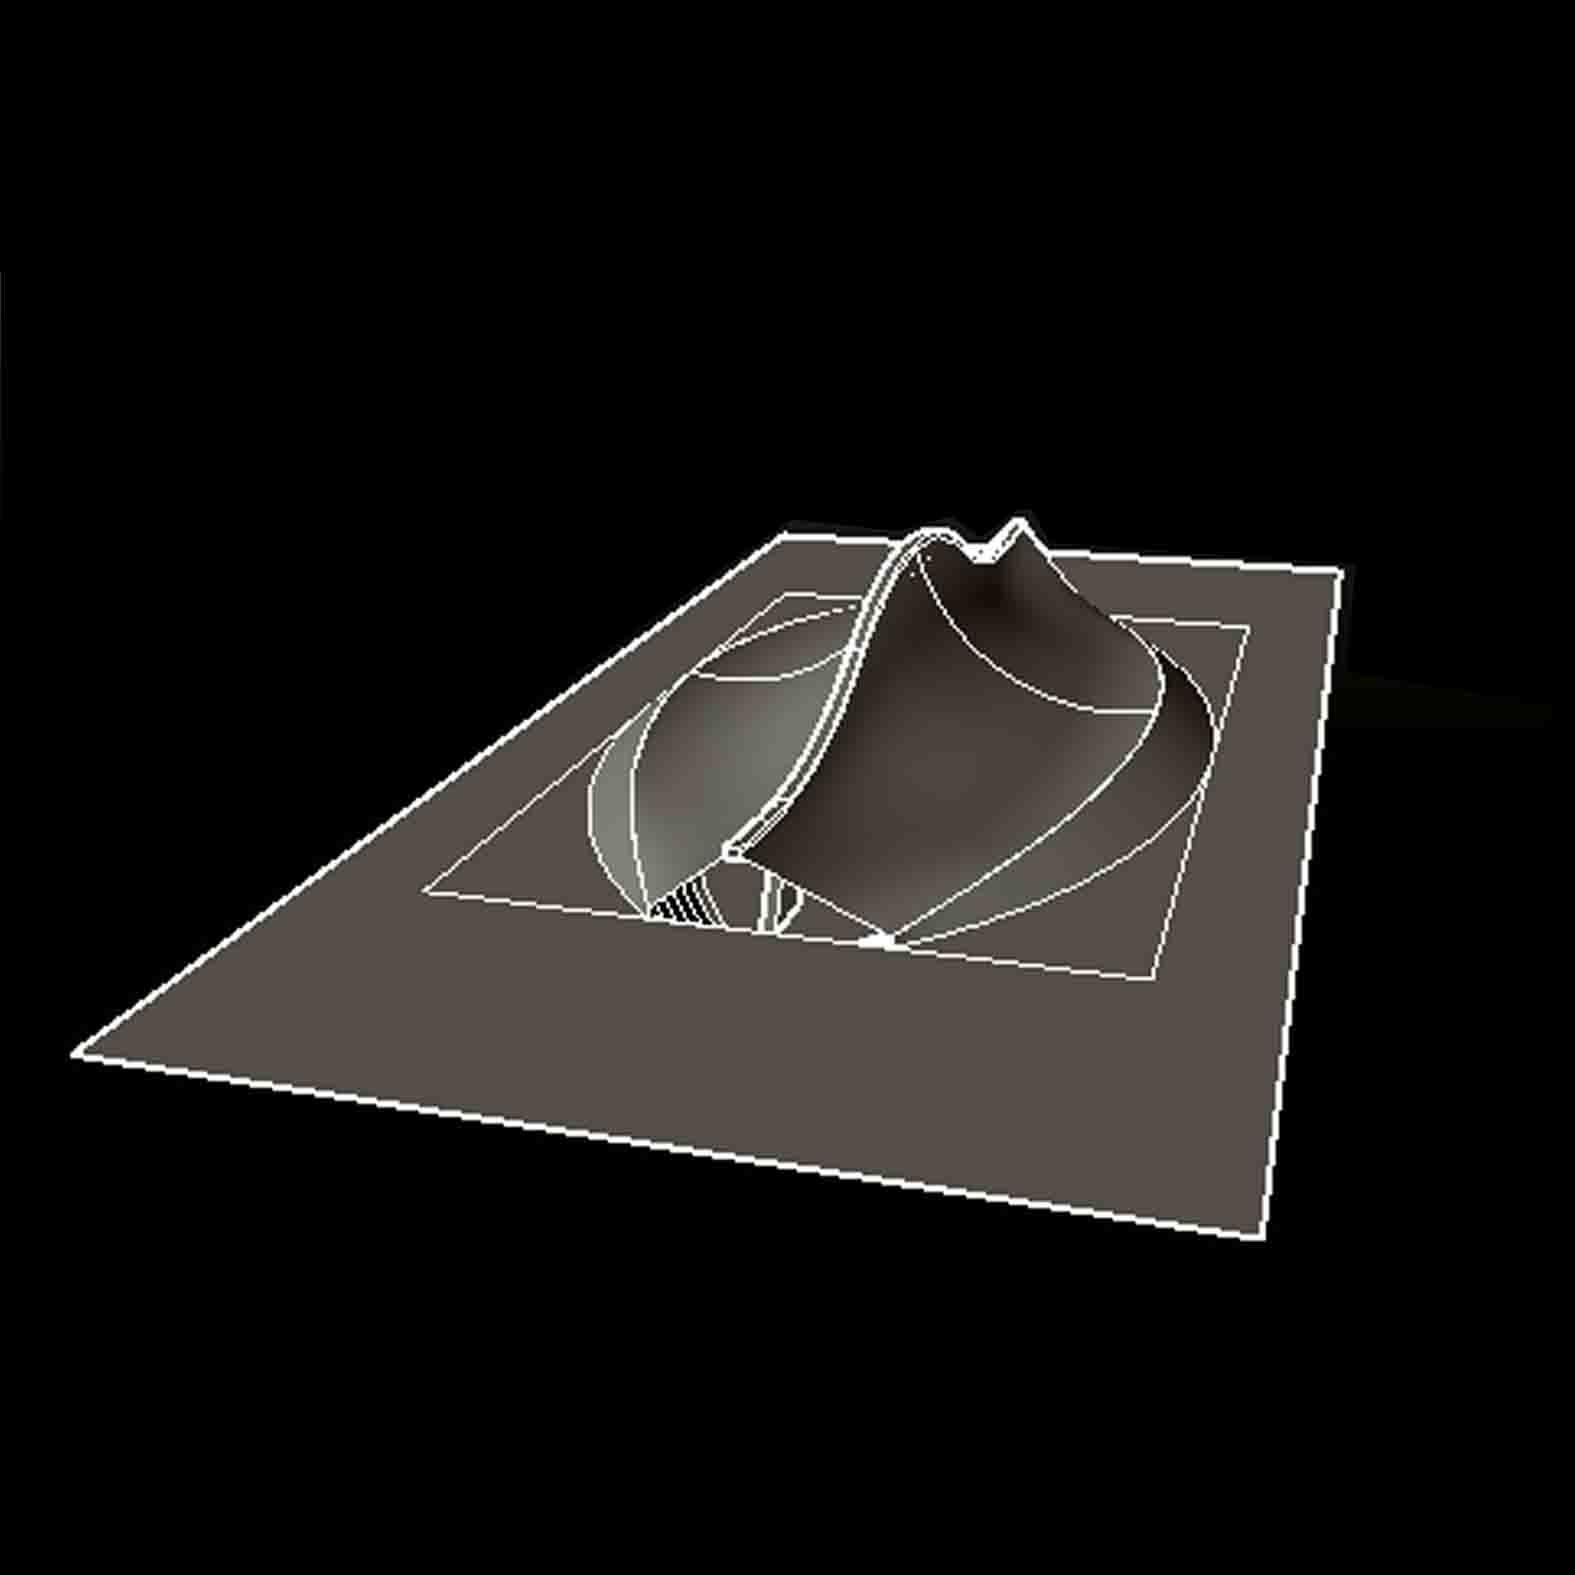 Modelo: Estadio / Santiago Calatrava